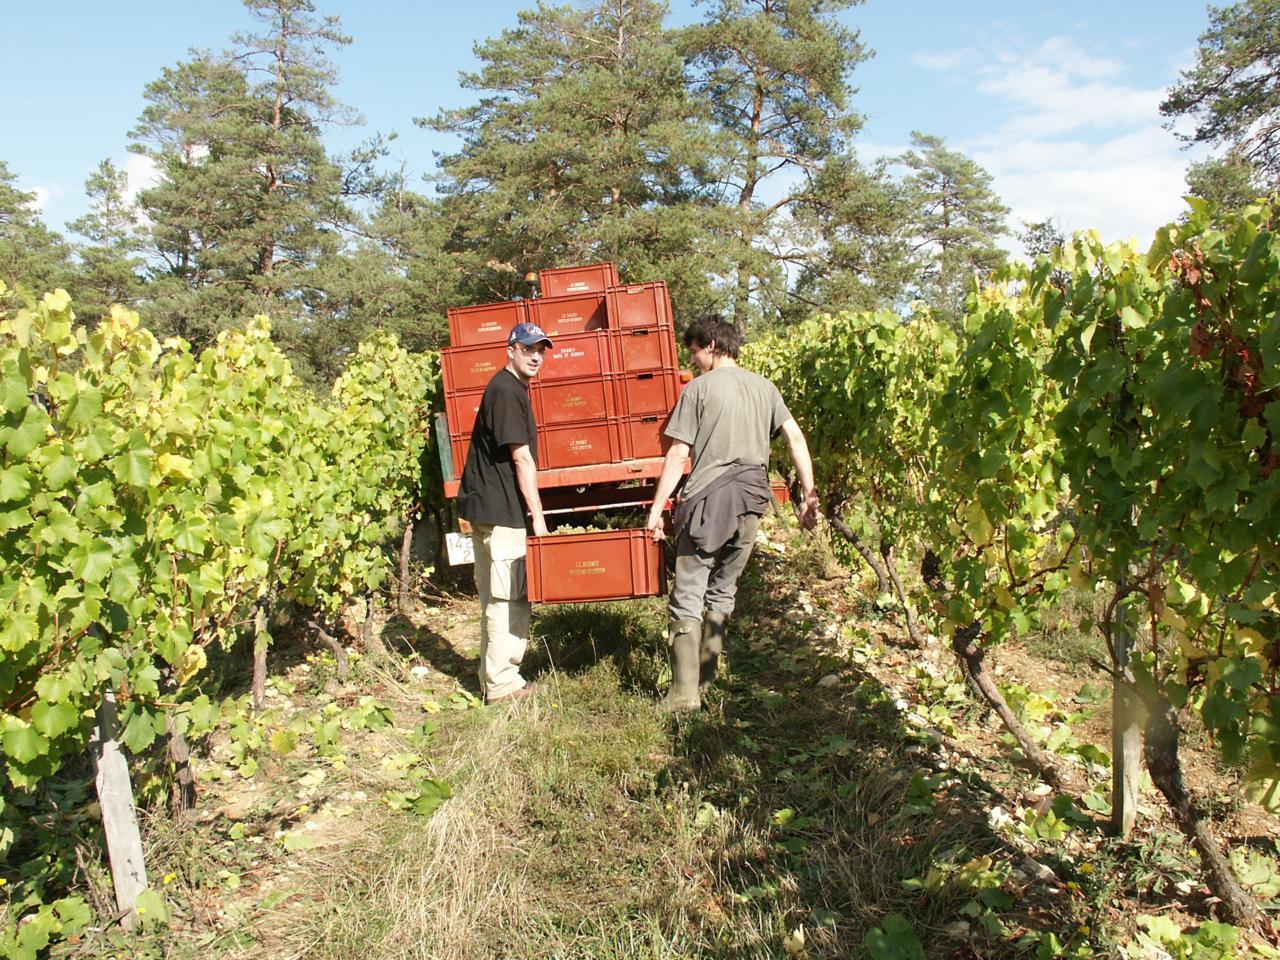 France_Bourgogne de Vigne en Verre_Winery Image.JPG